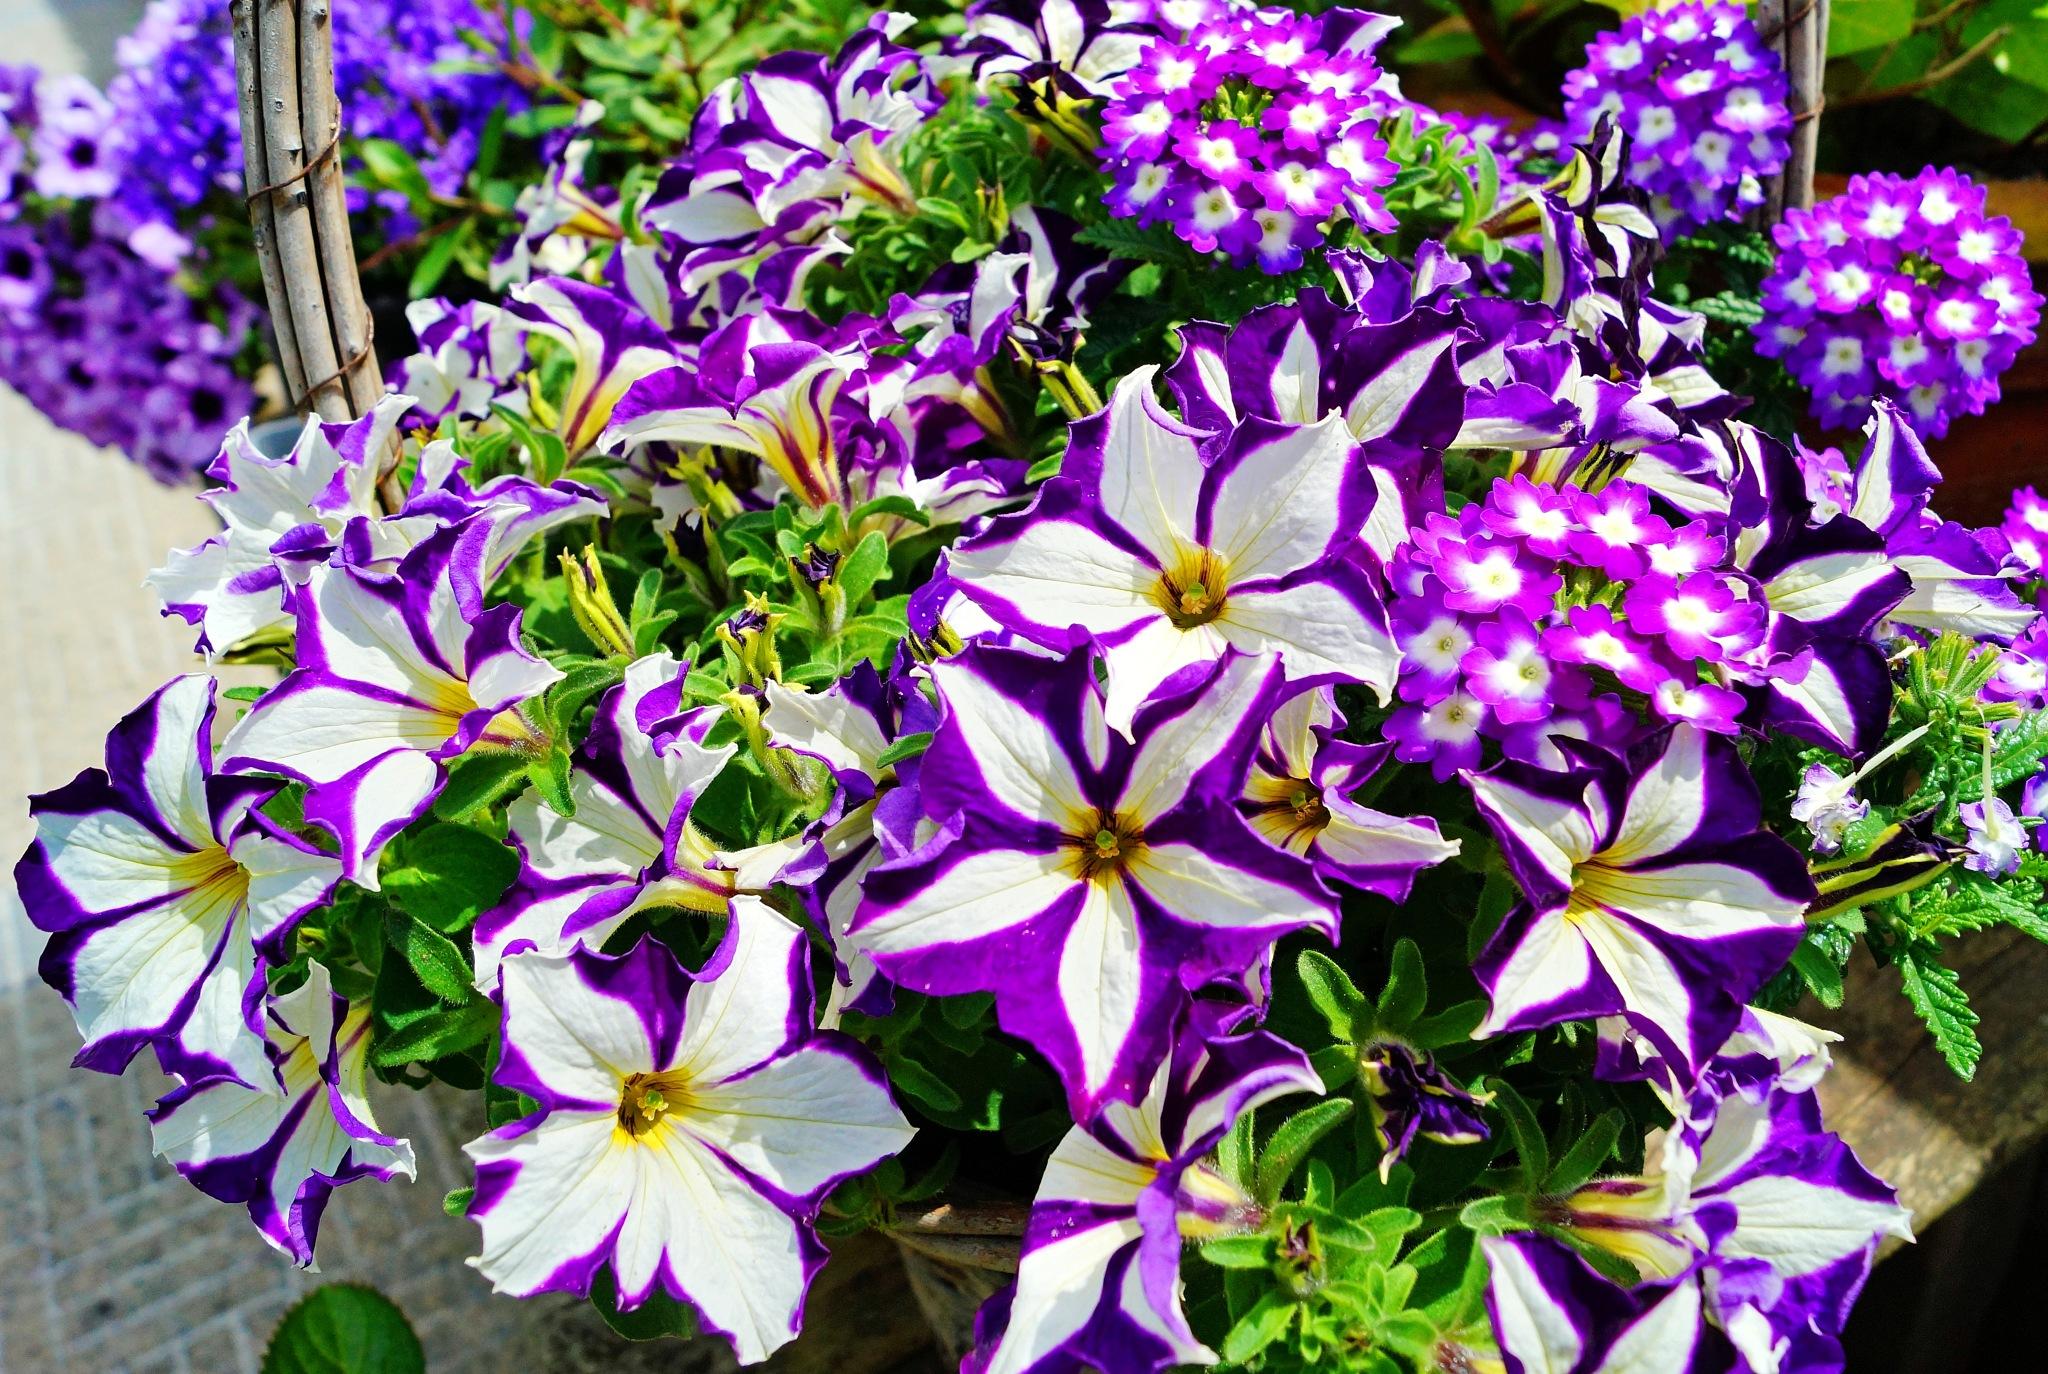 Basket of Summer Flowers by Marian Baay